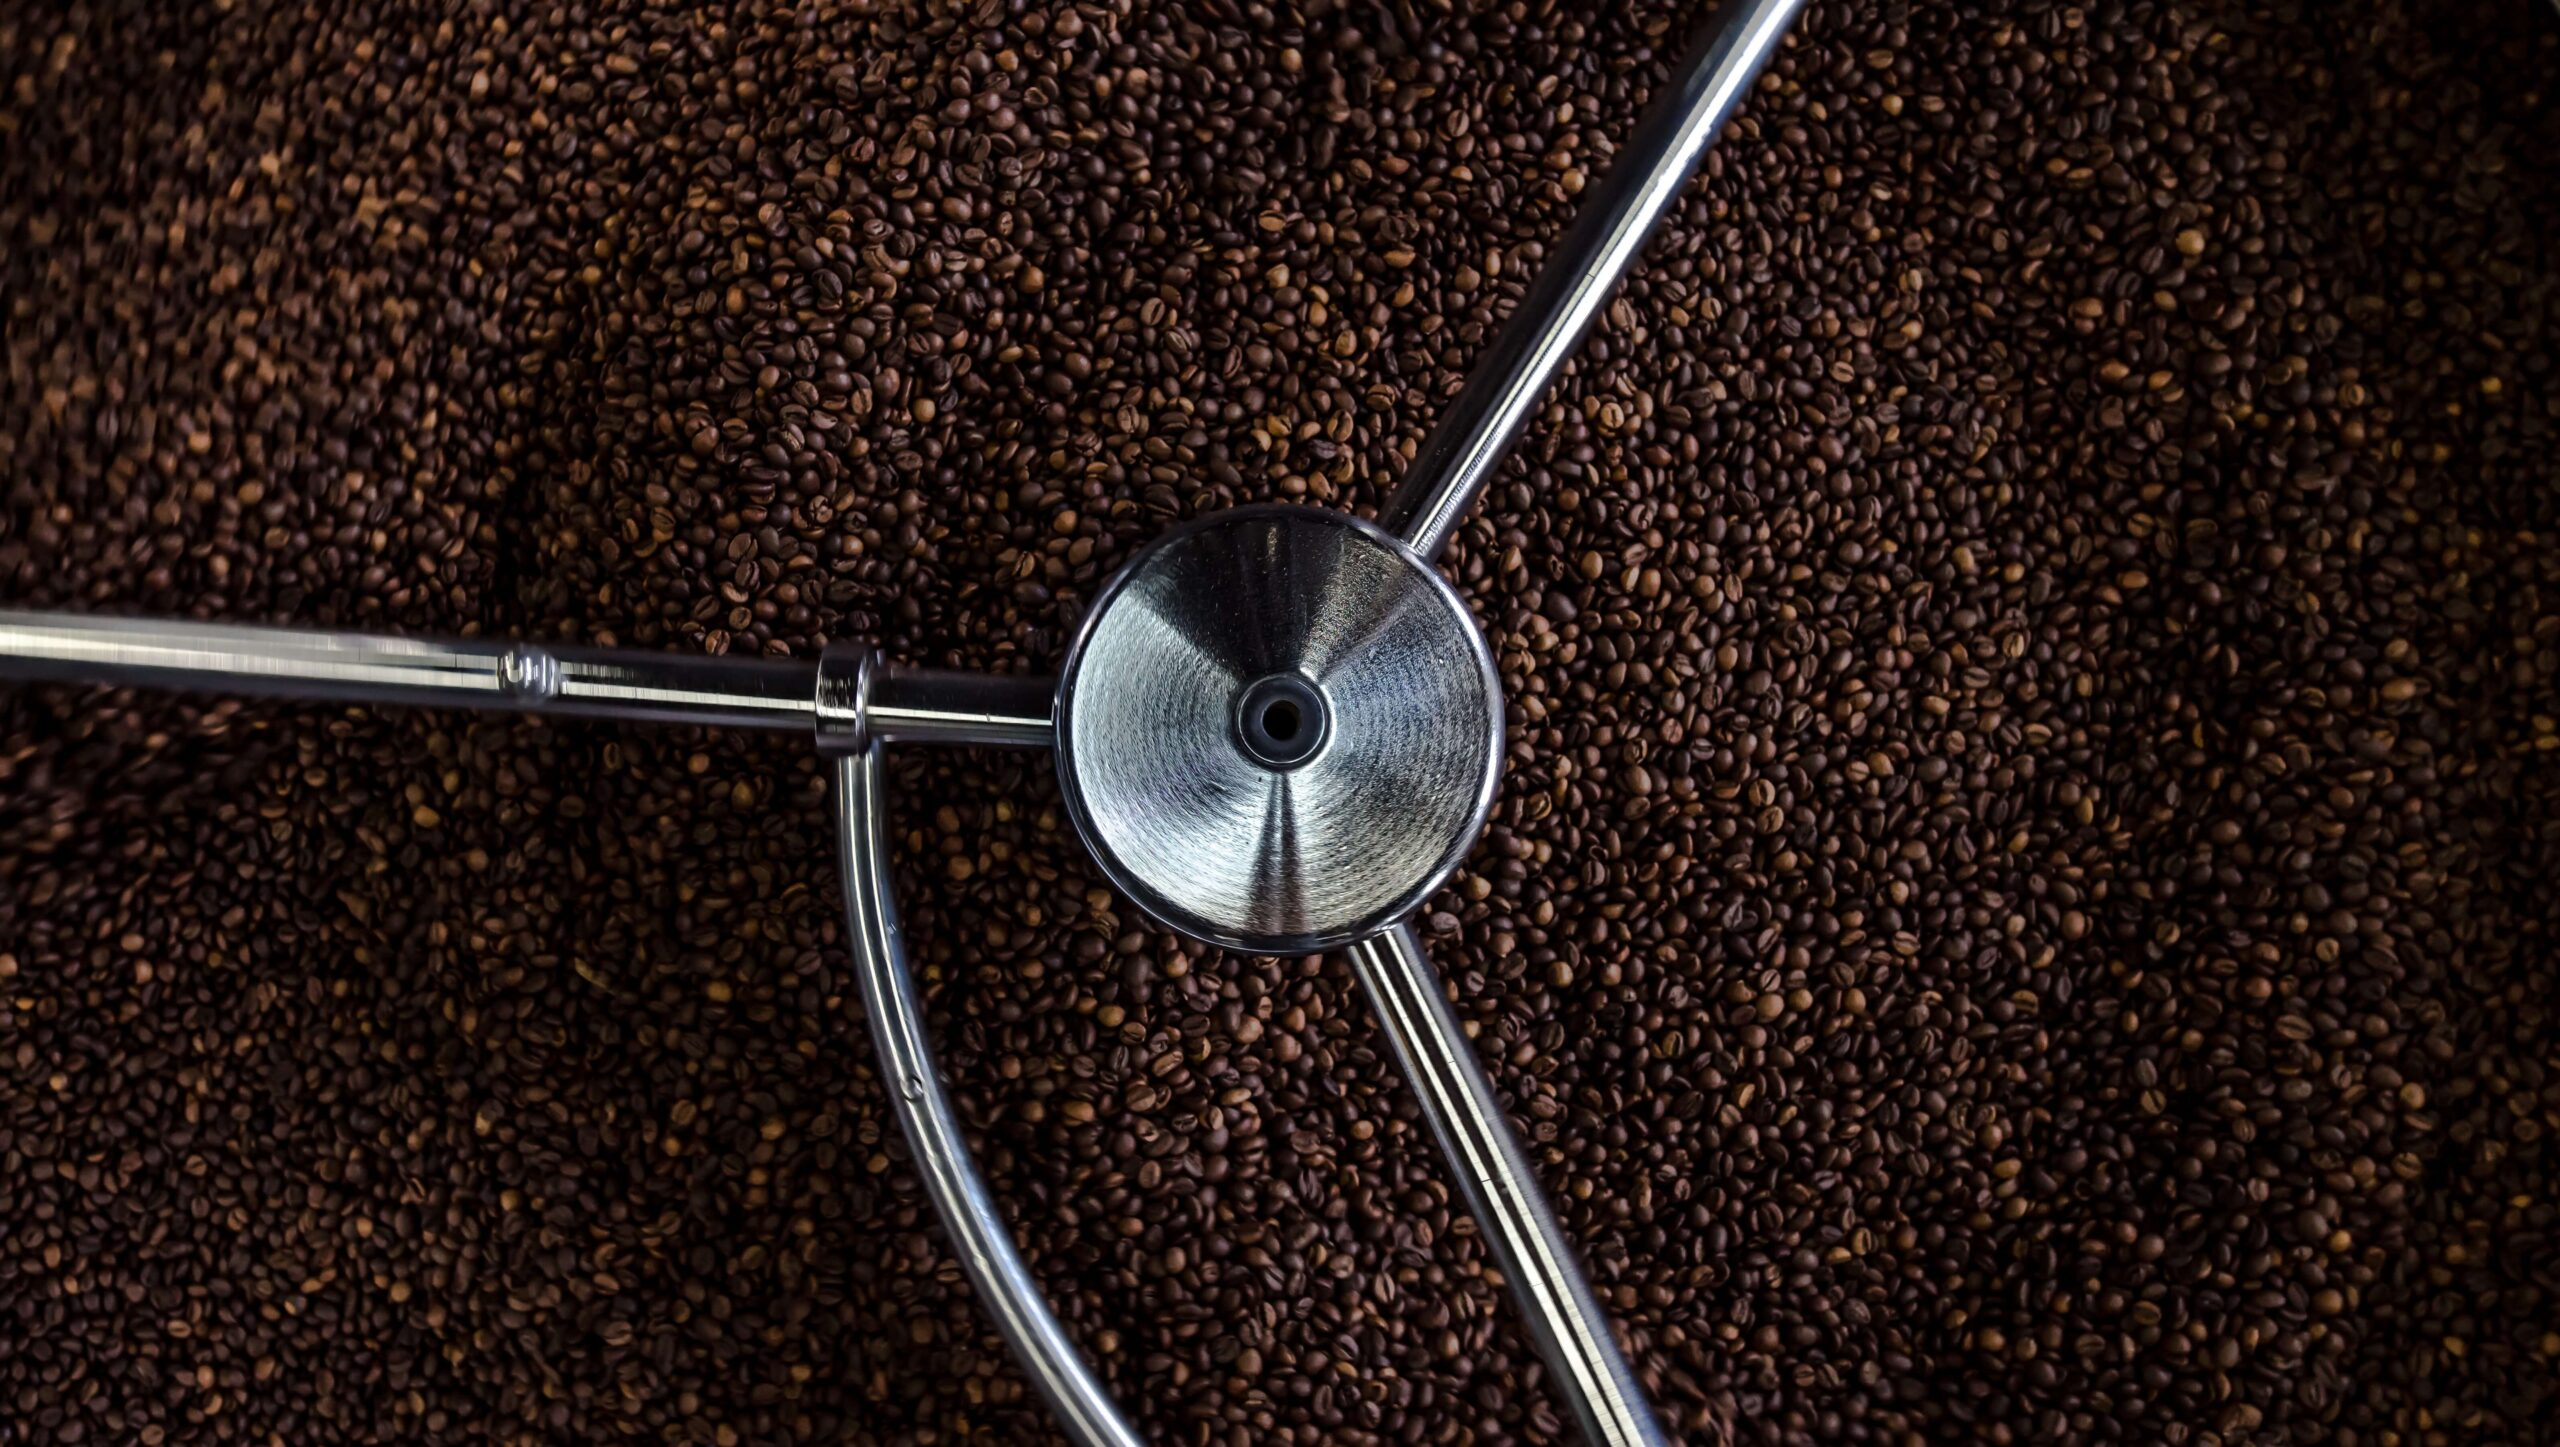 обжарка кофе охлаждающий поддон